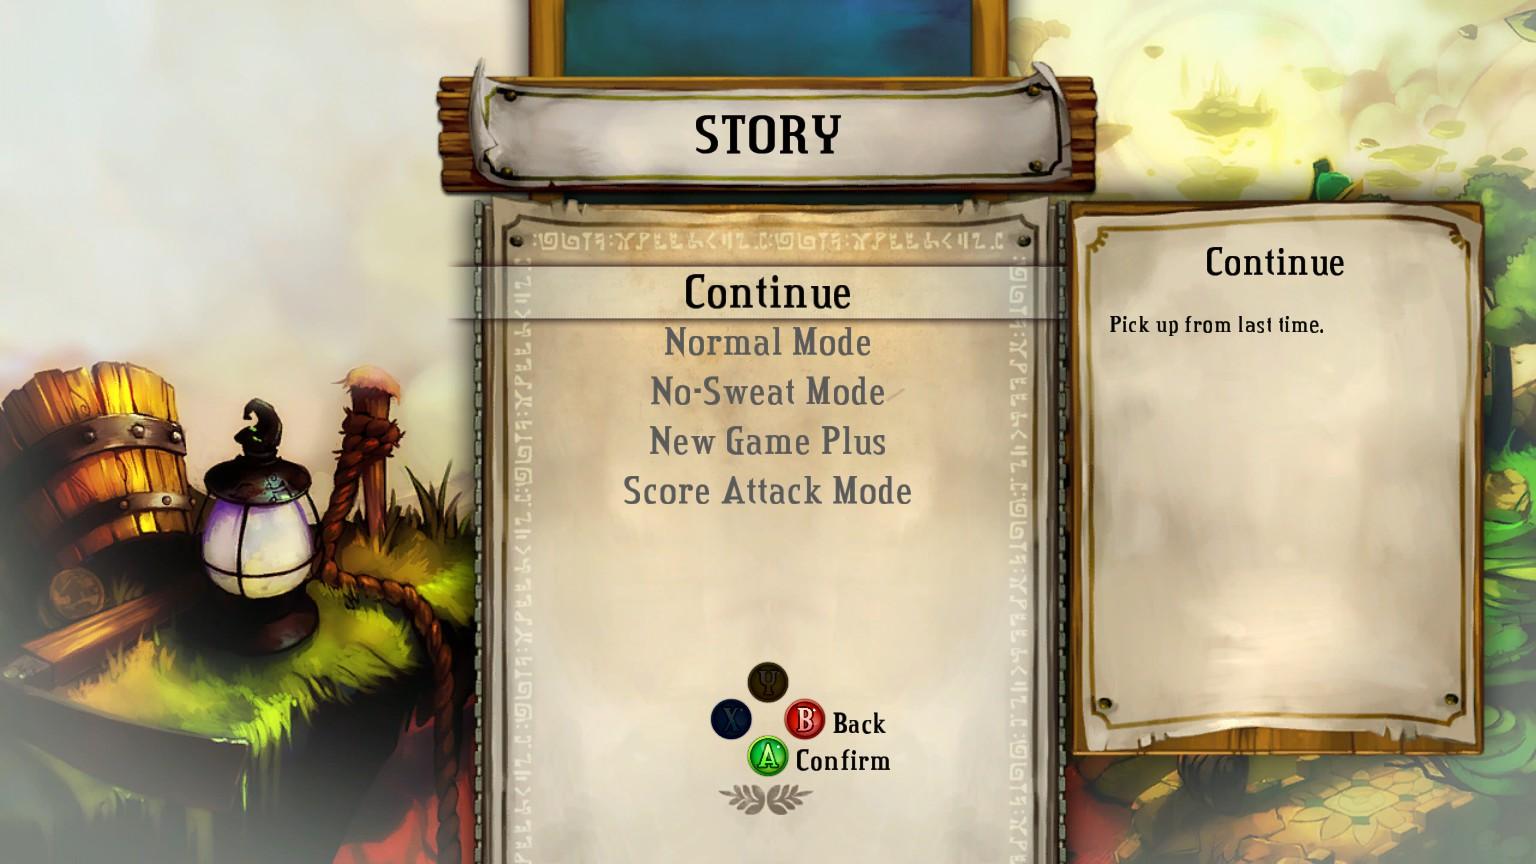 Bastion - Full Achievements Unlocked & Walkthrough Gameplay - NG+ (8/24) - 1DD60FC